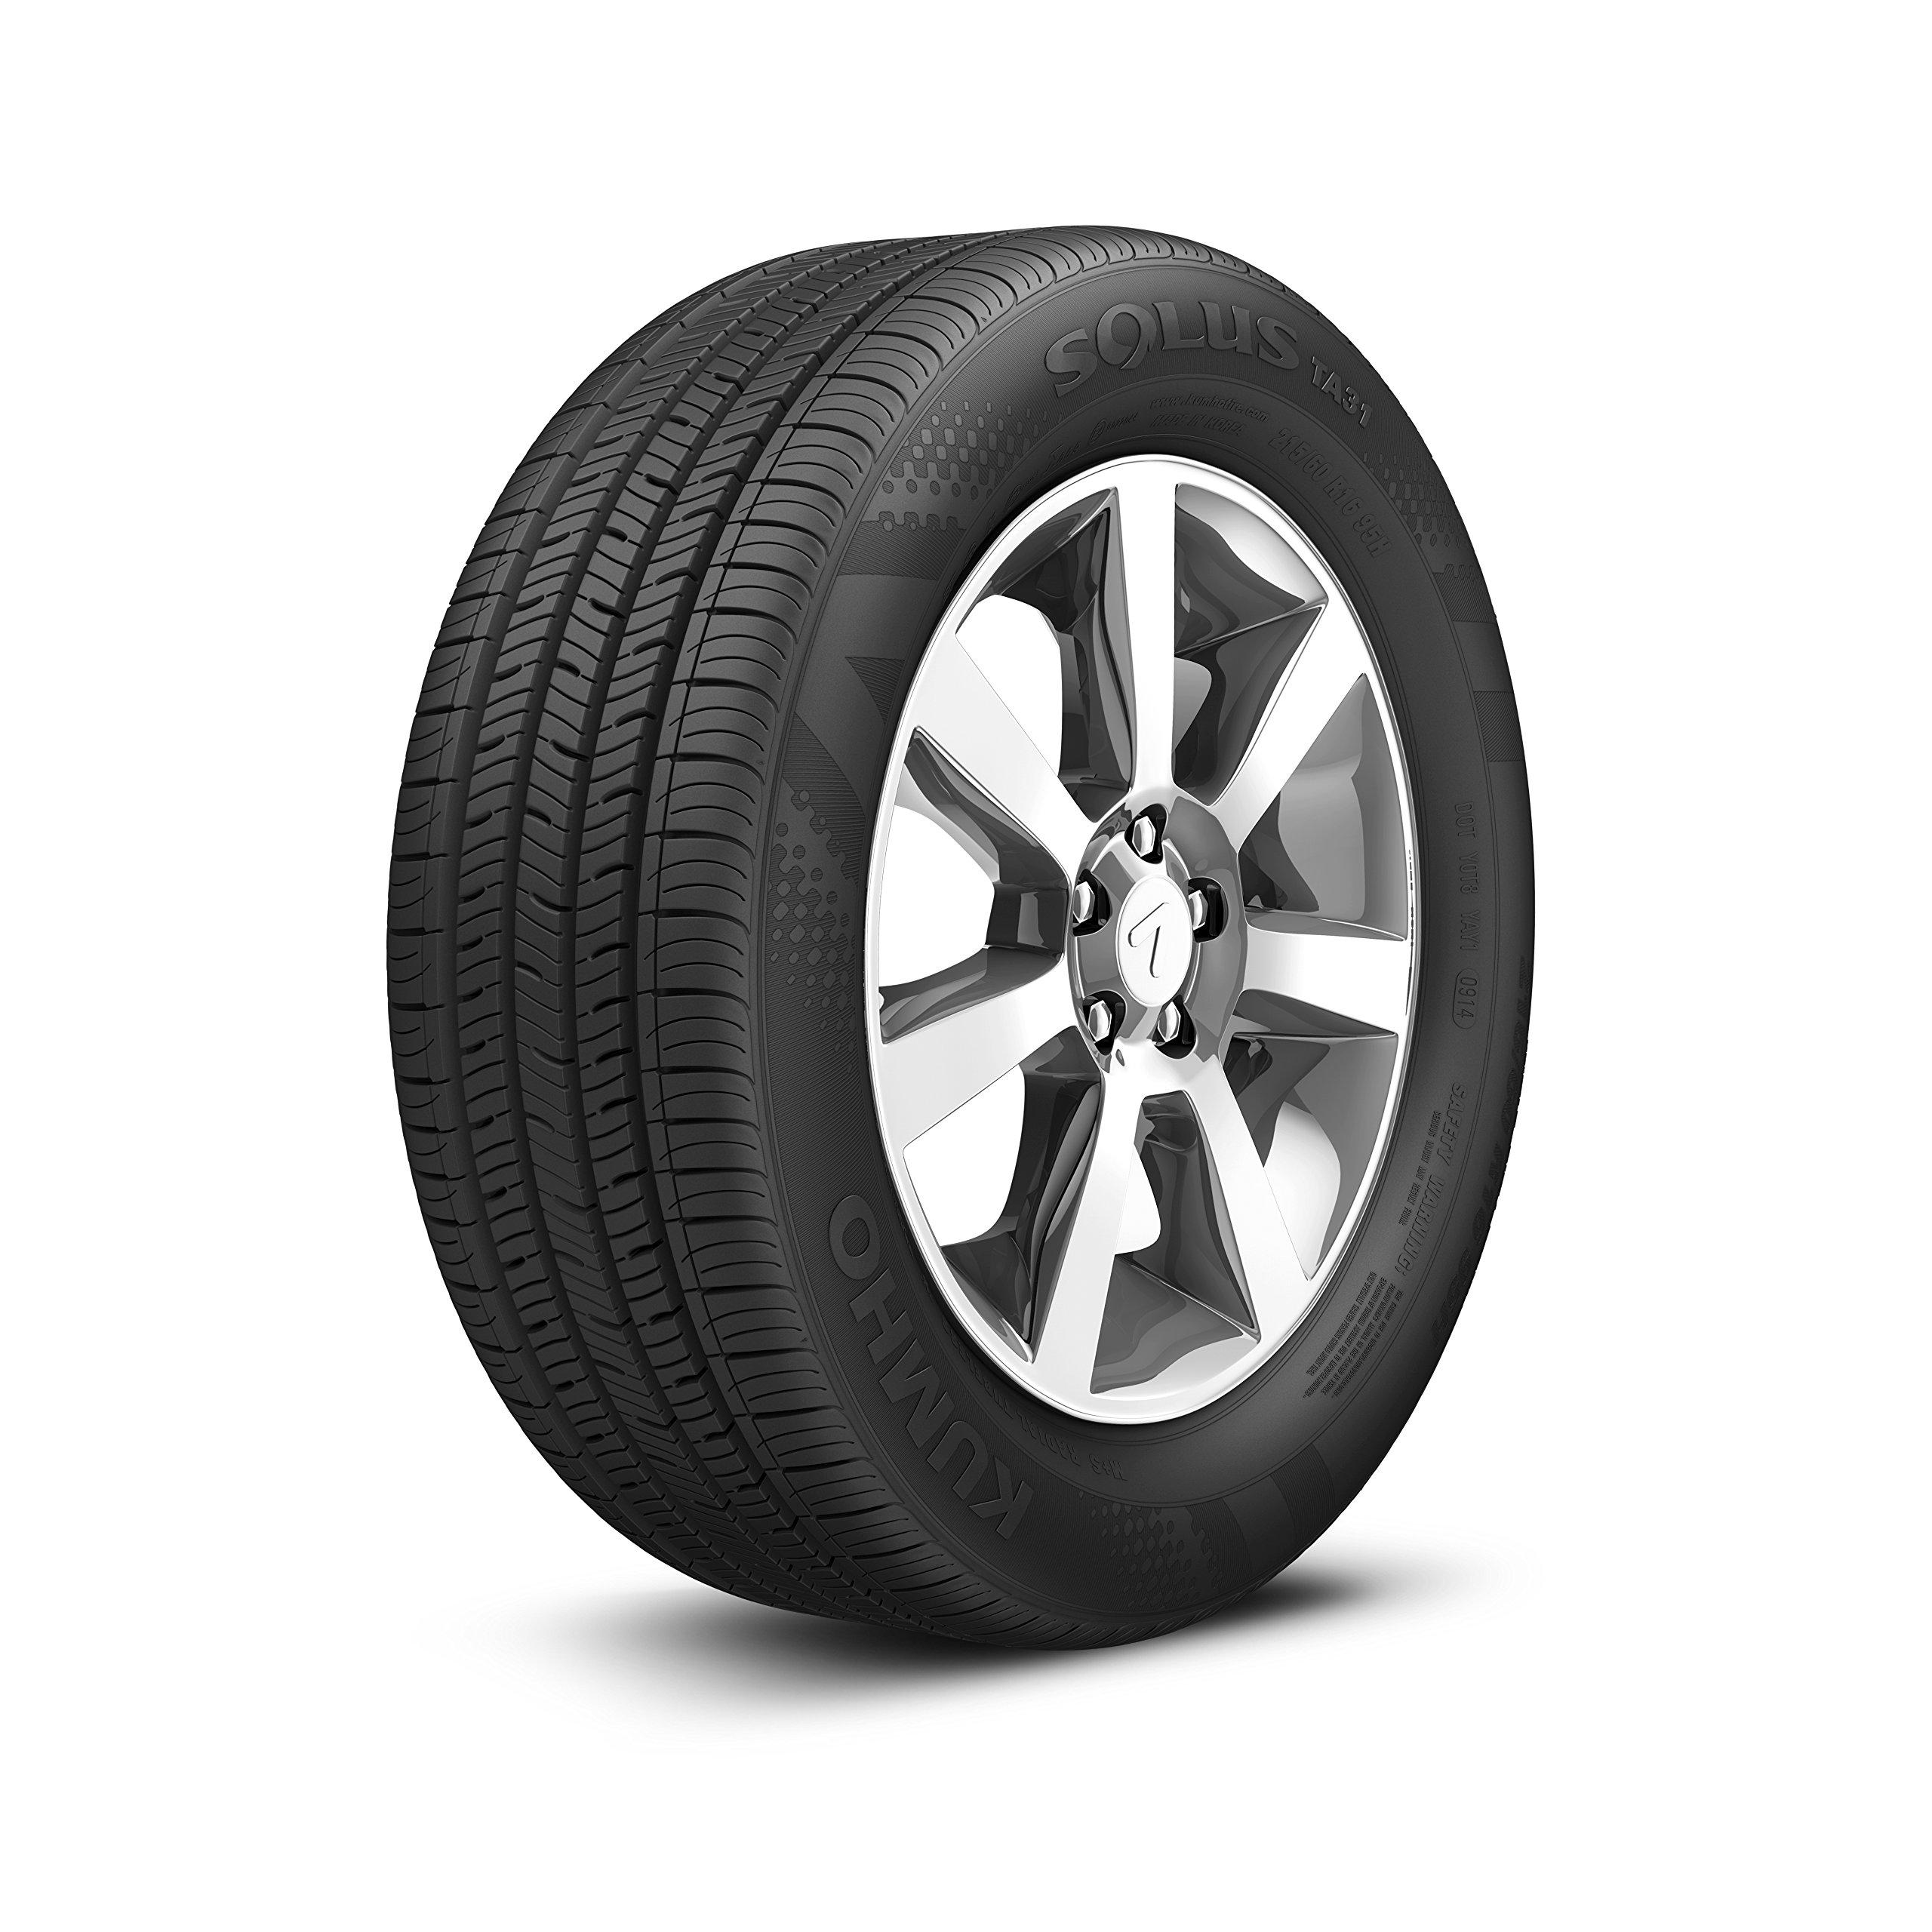 Kumho Solus TA31 Touring Radial Tire - 235/45R18 94V by Kumho (Image #1)